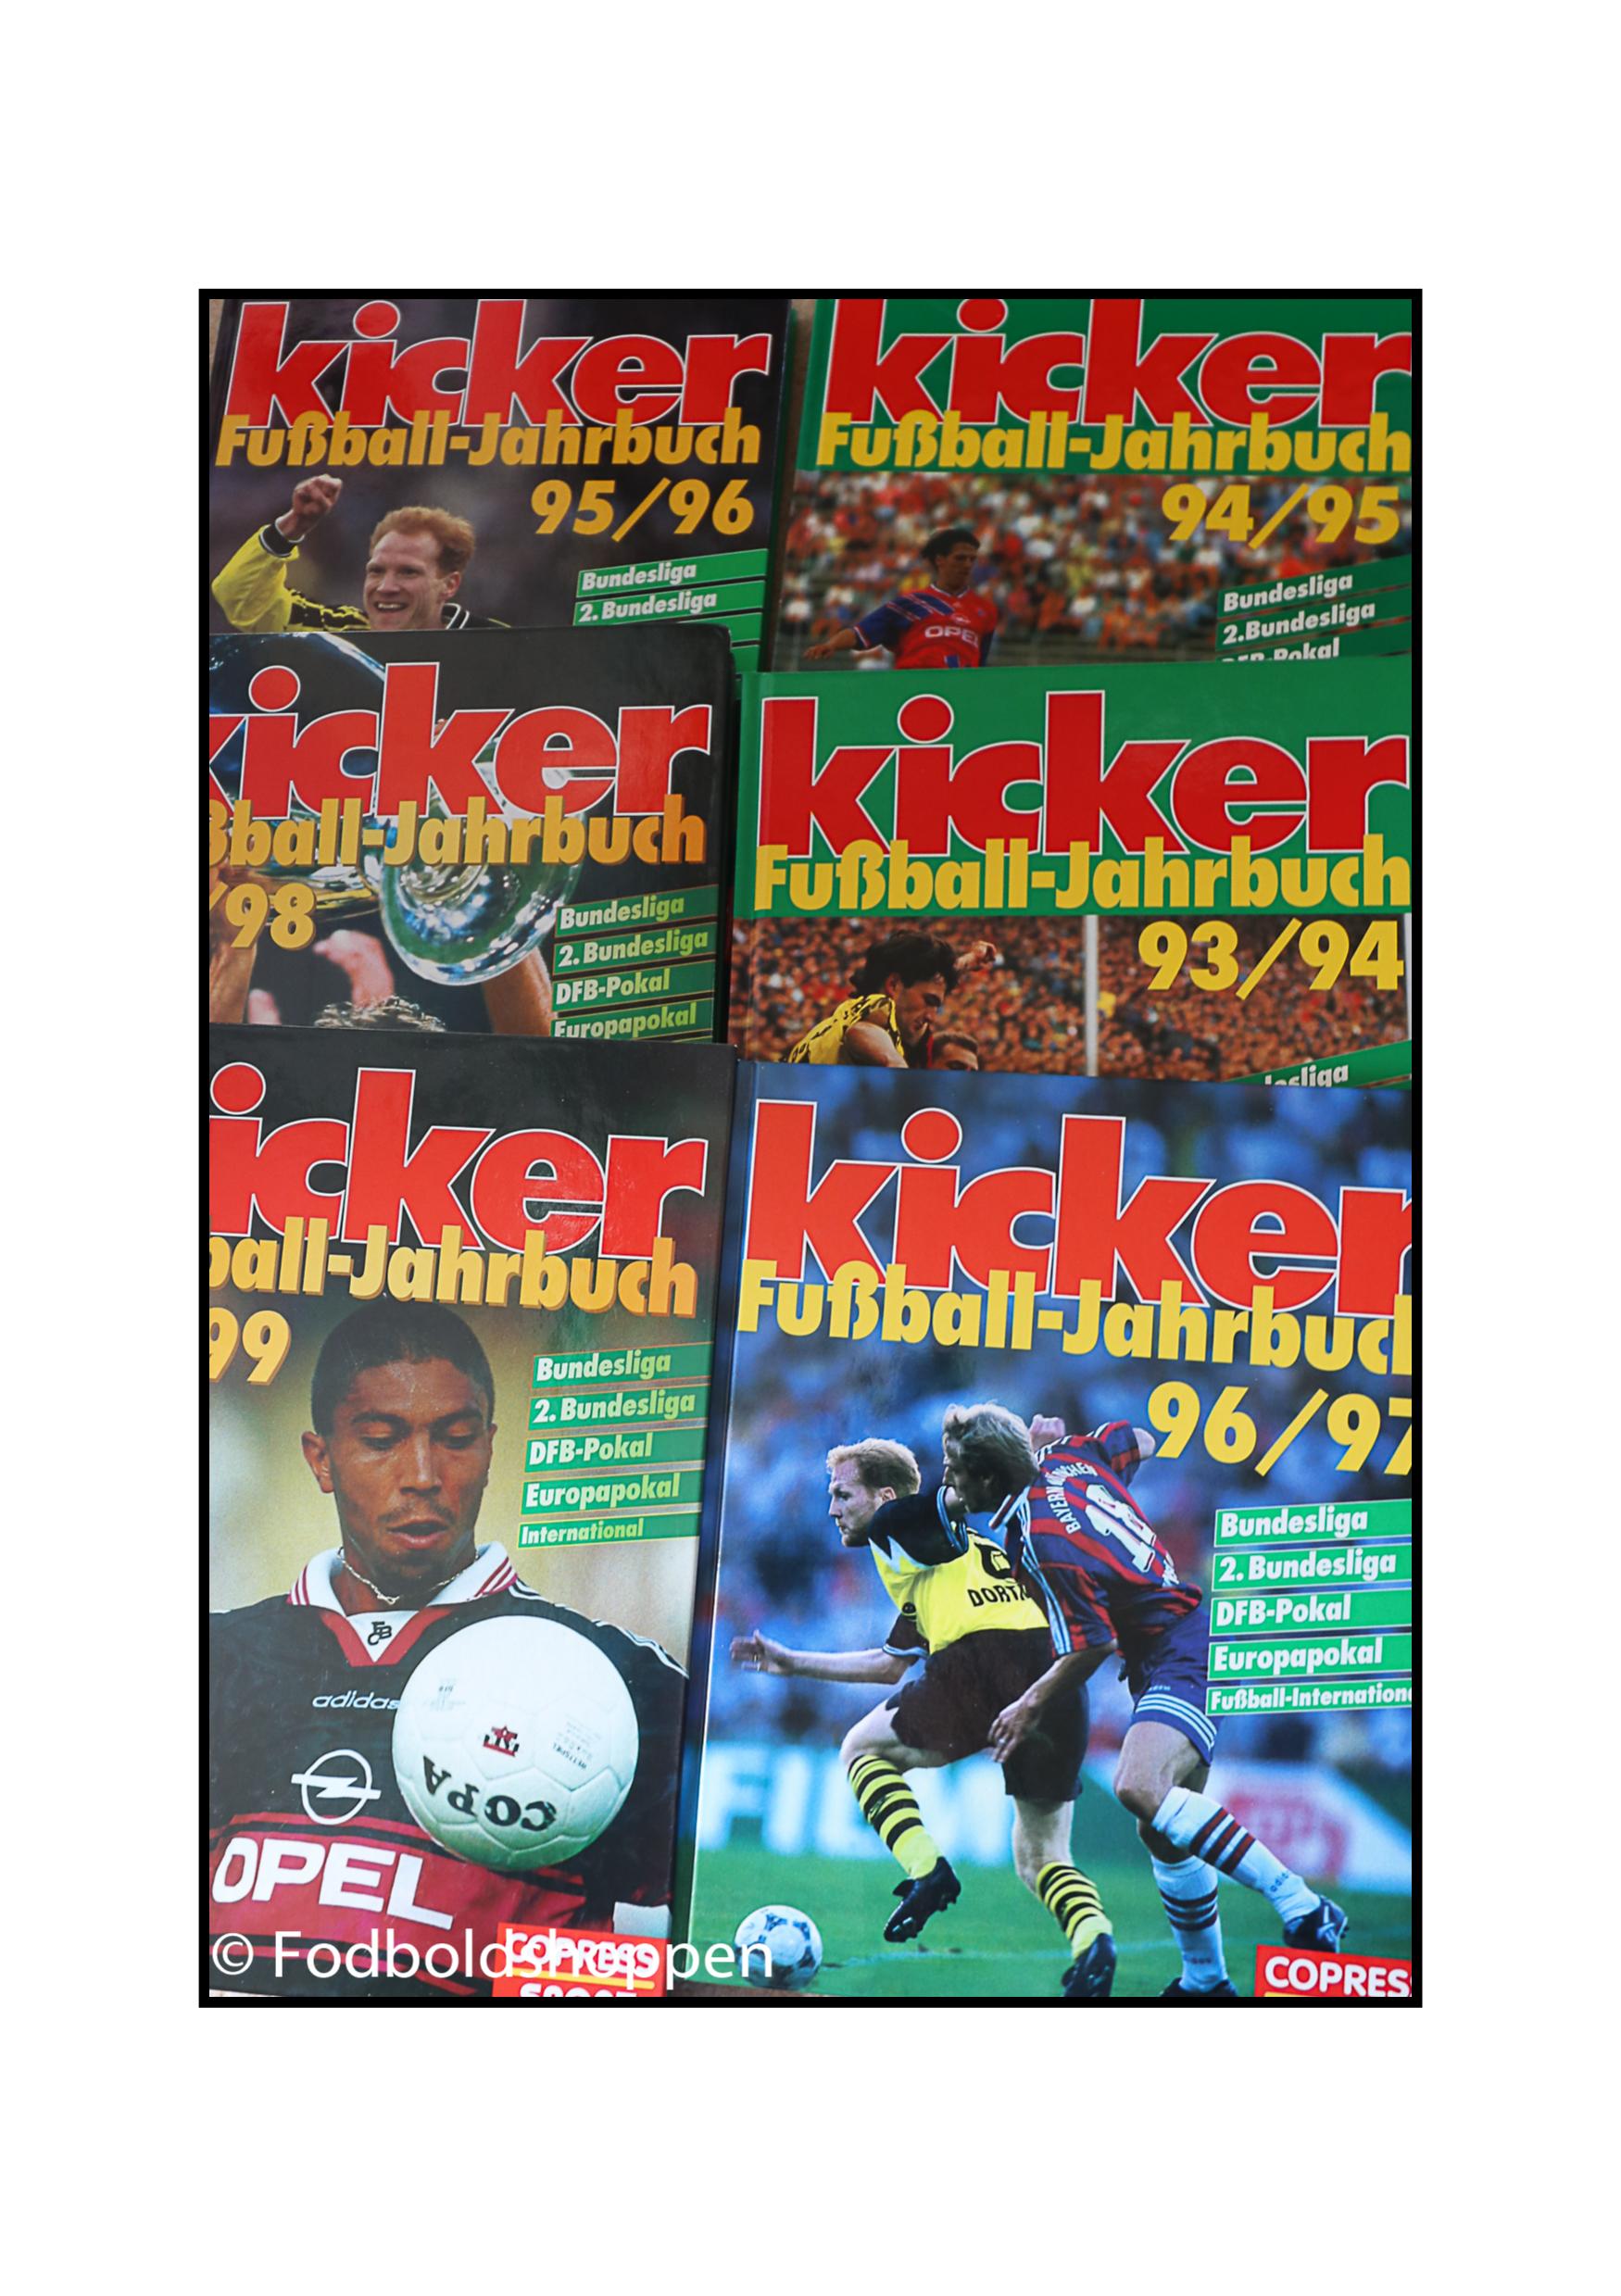 Kicker Fussball Jahrbuch